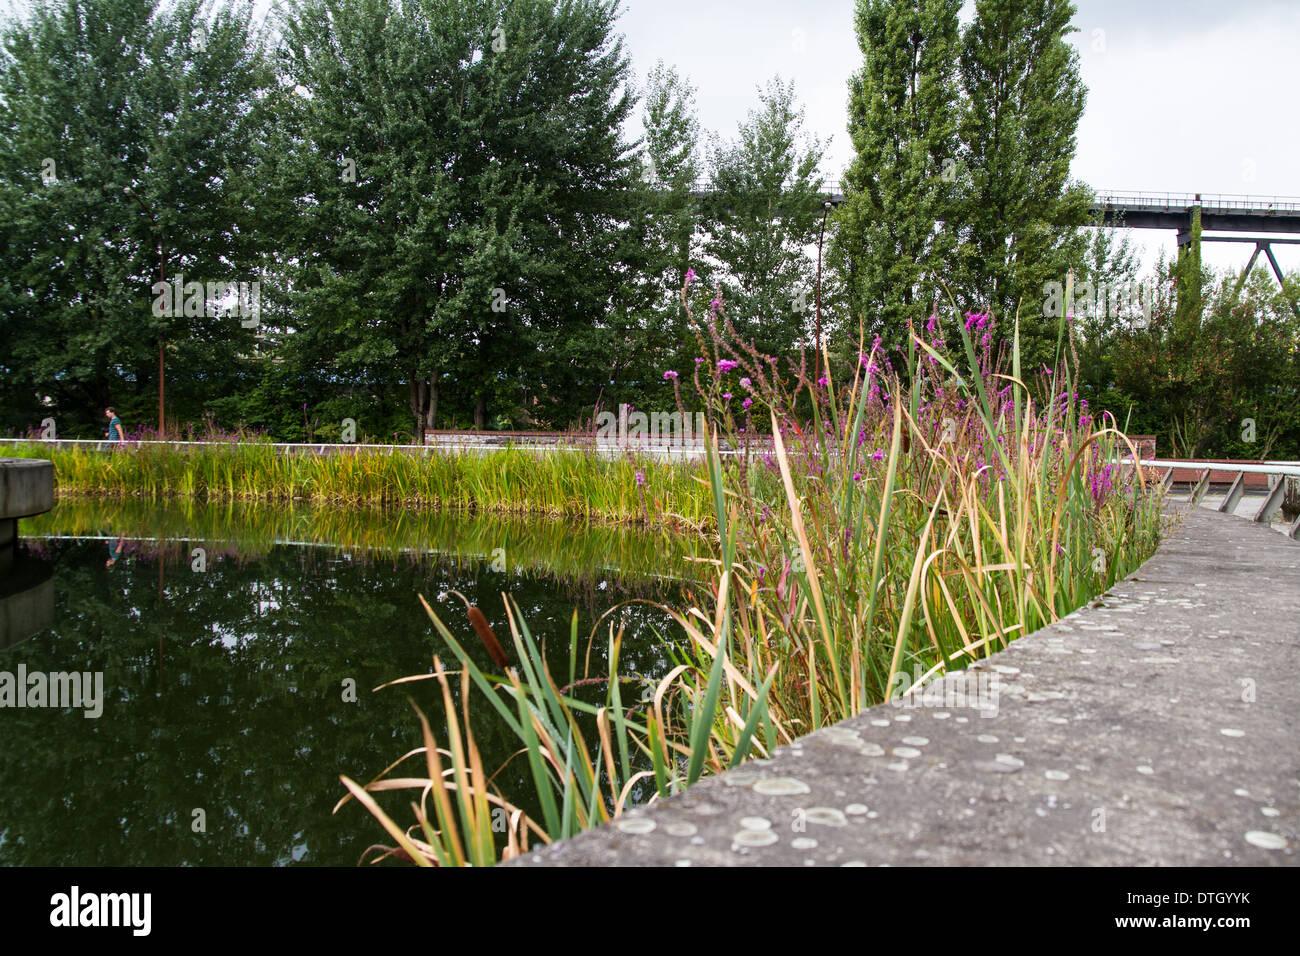 Landschaftpark Duisburg Nord reclaimed coal and steel plant - Stock Image